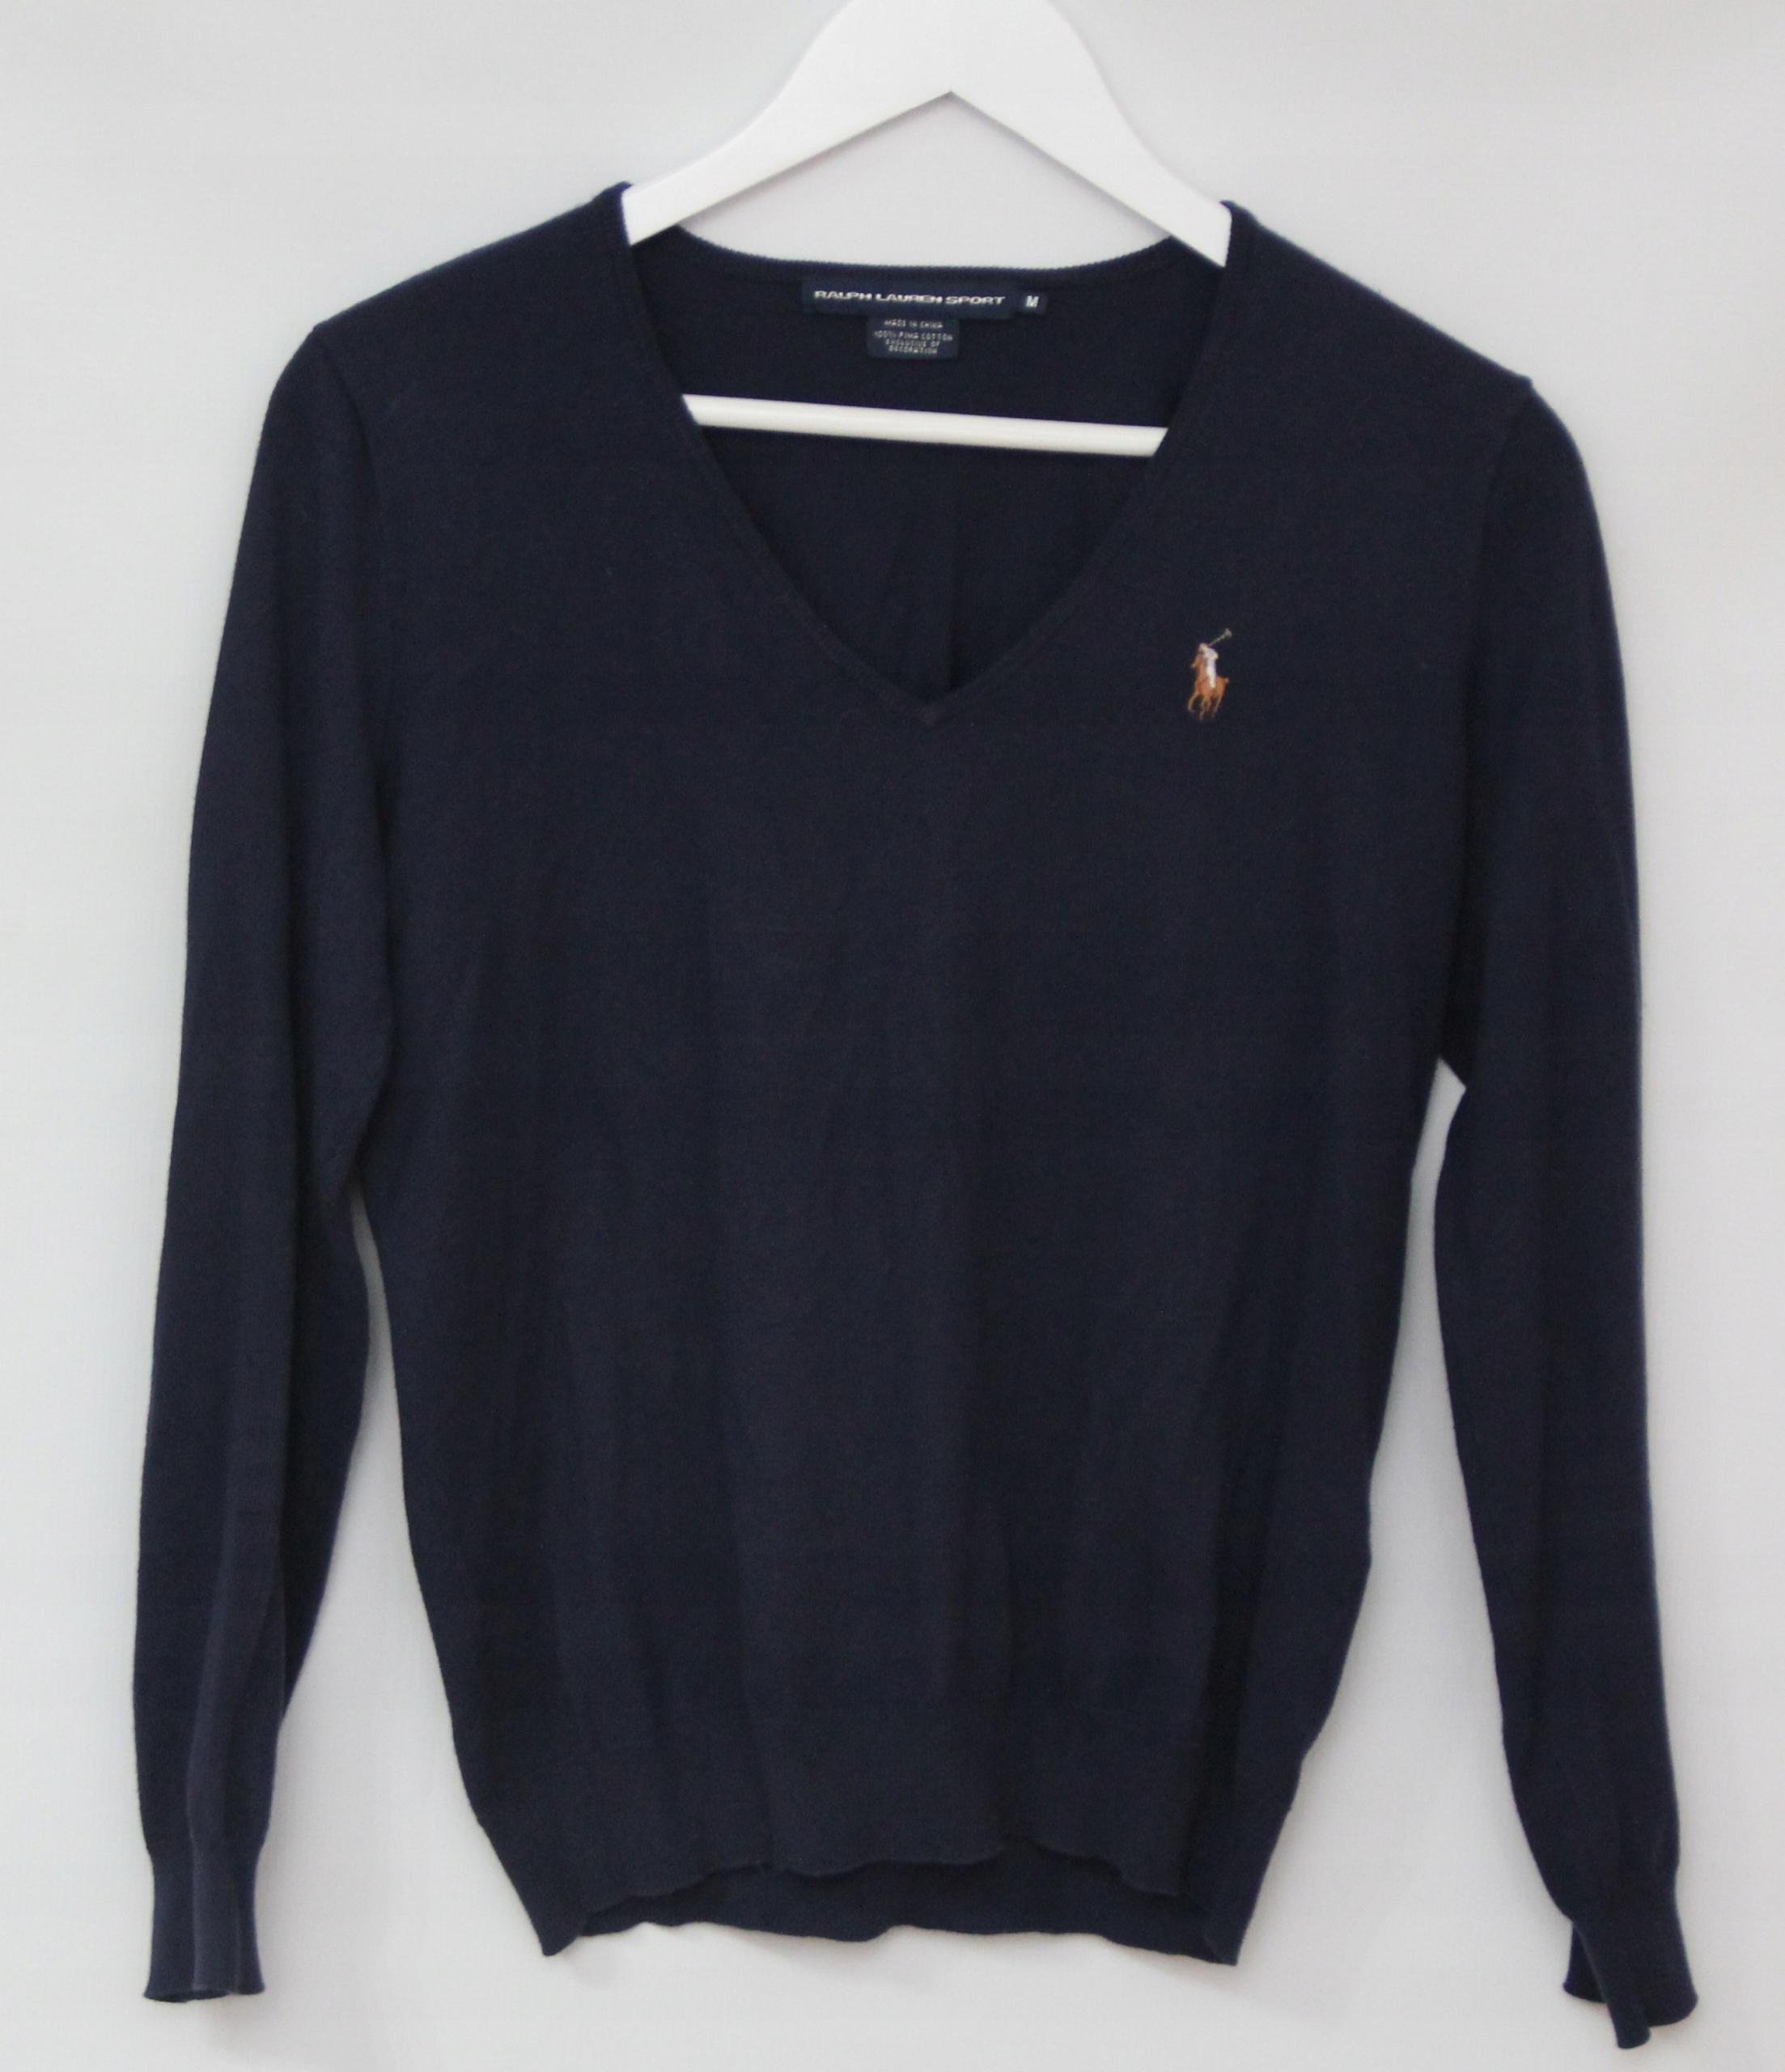 Męski sweter Ralph Lauren Pma Cotton _M_